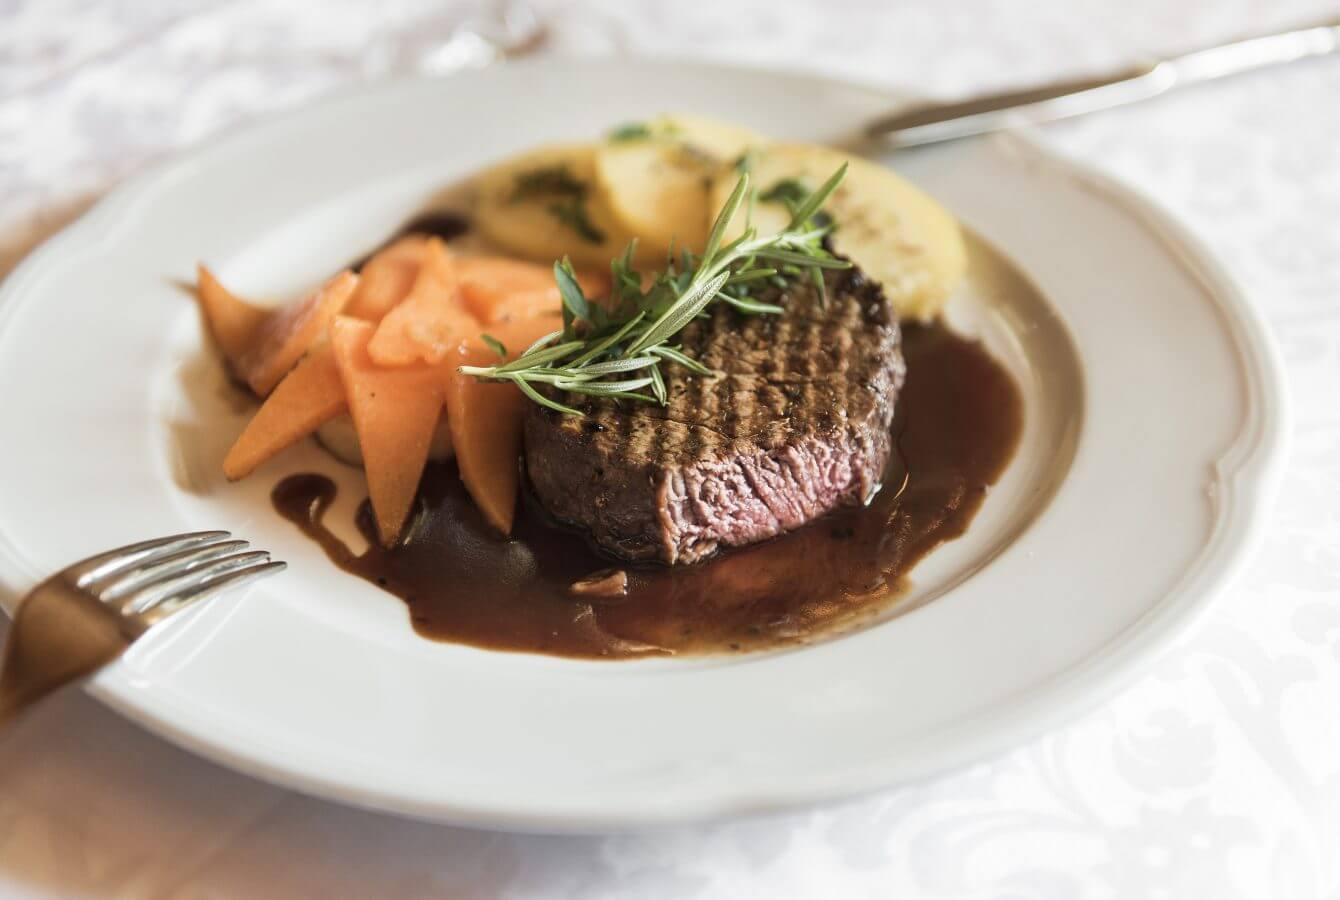 Almo Steak, Hauptspeise